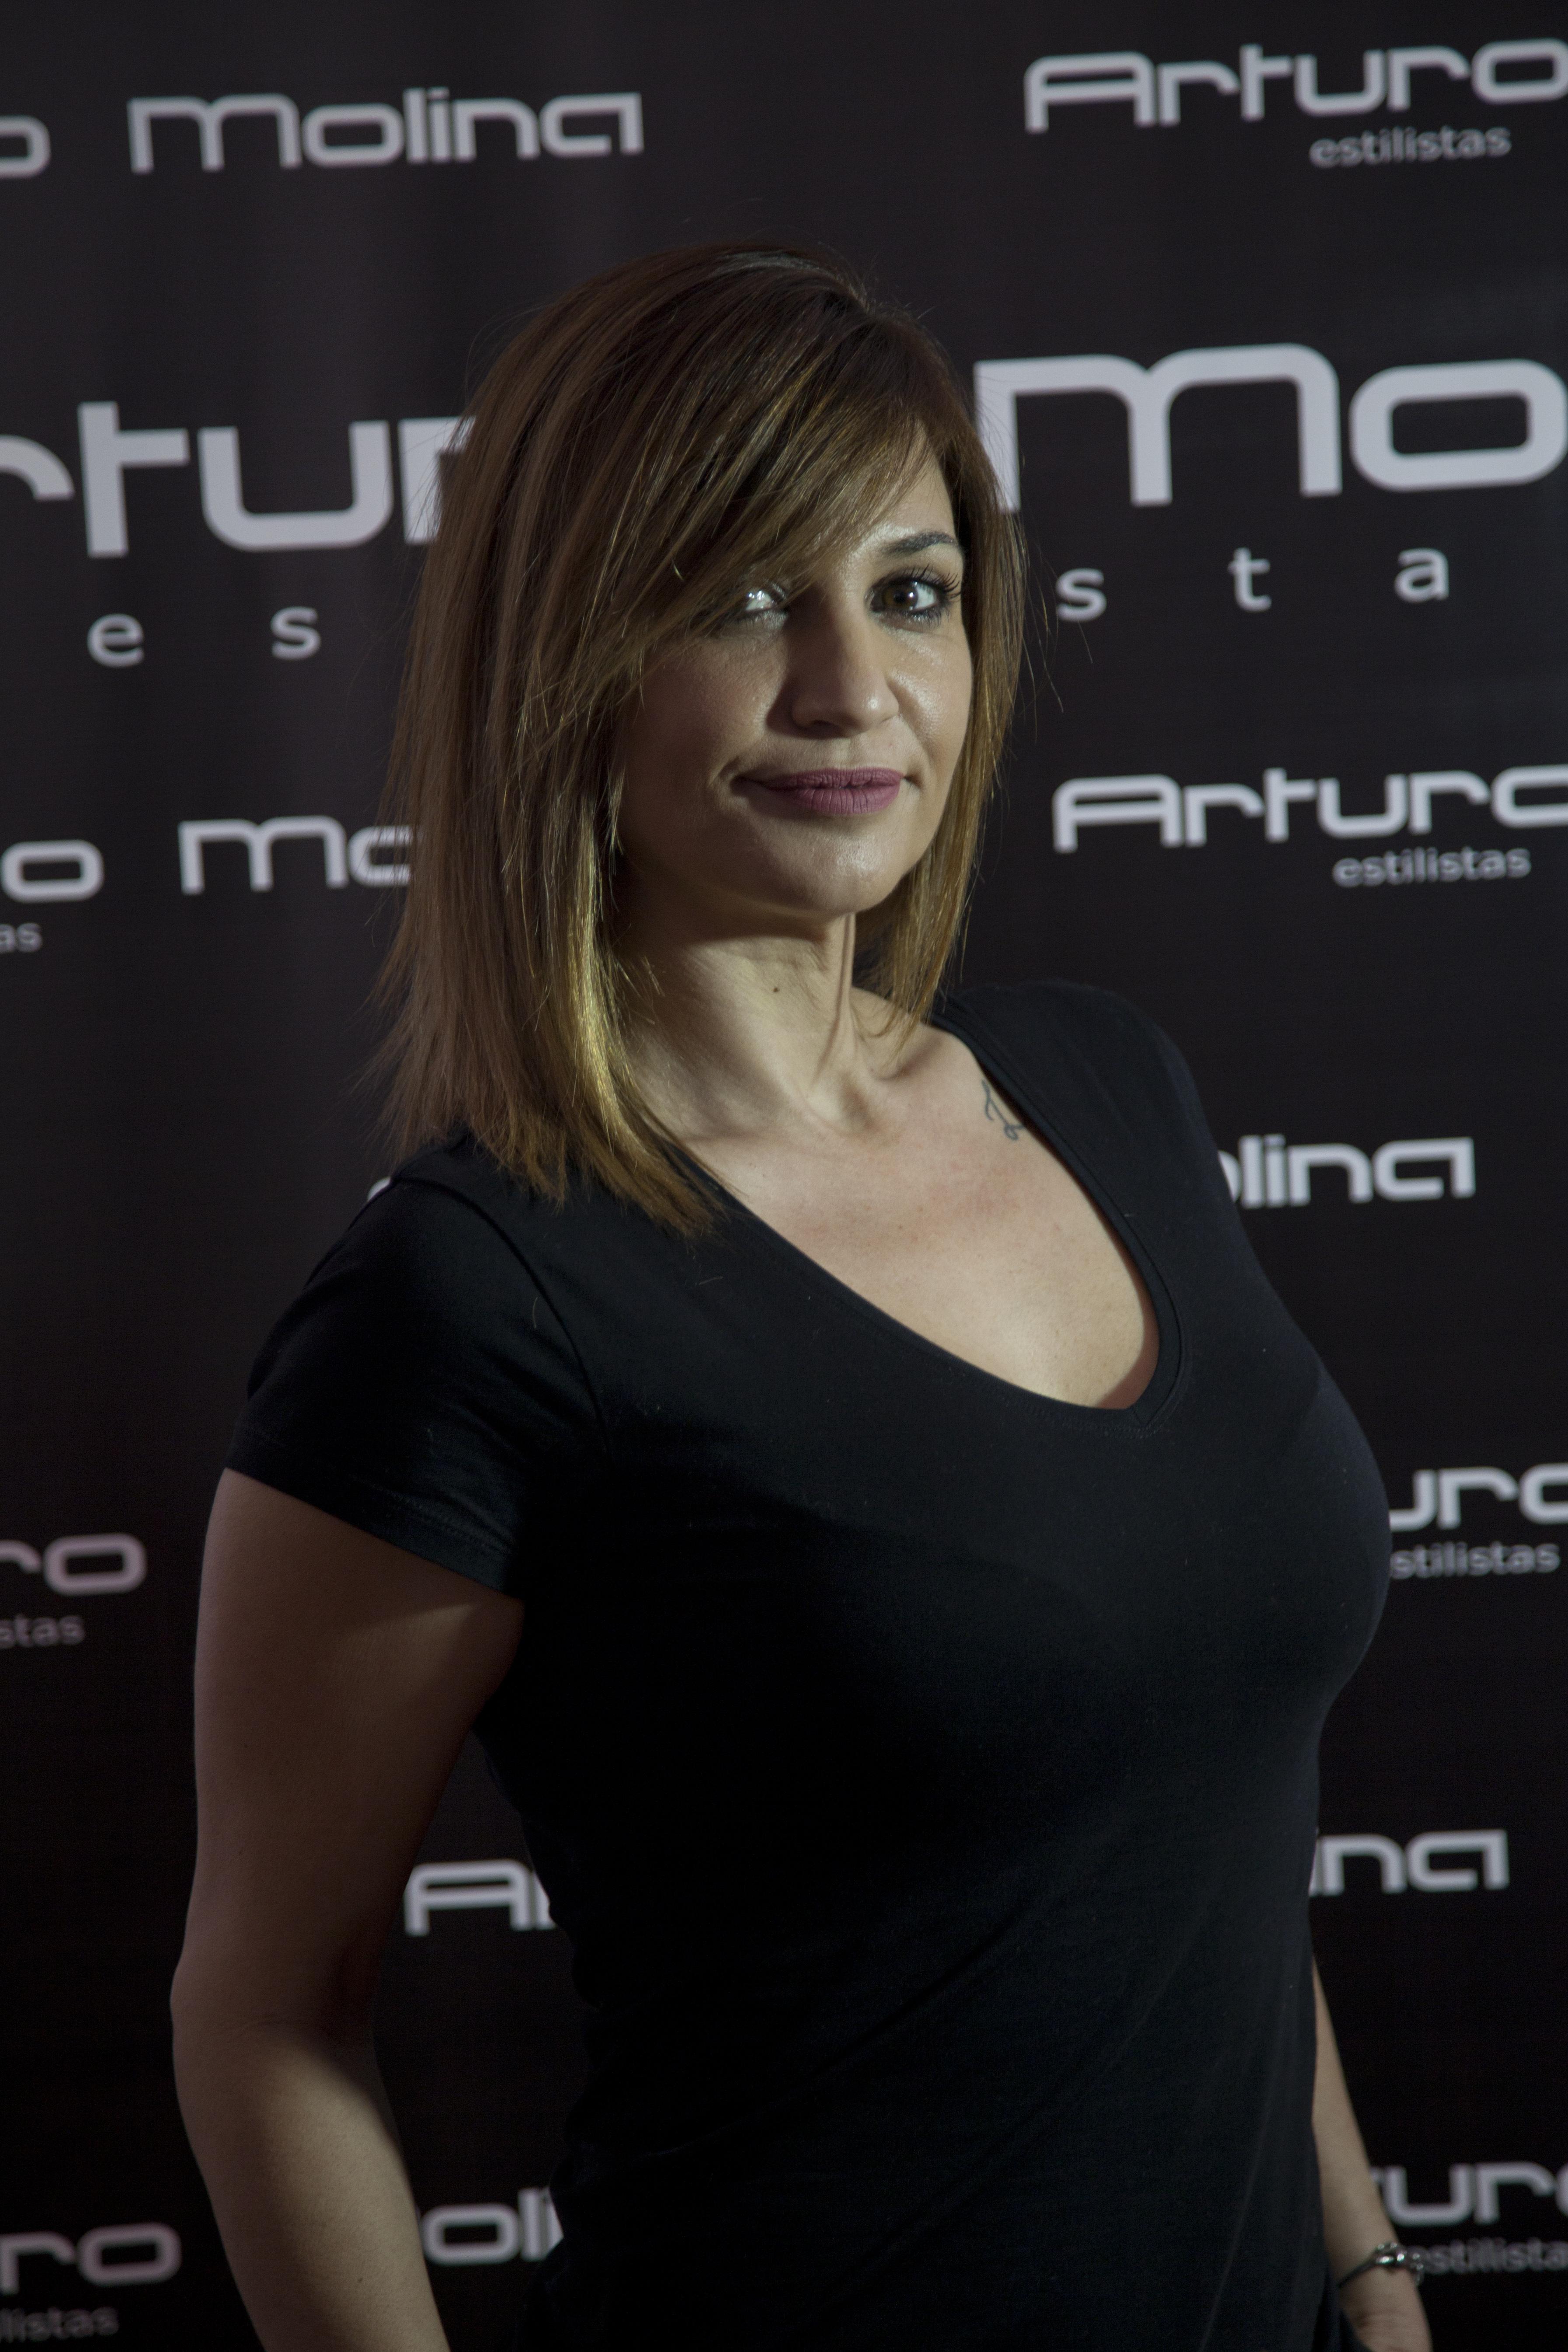 ArturoMOLINA-27